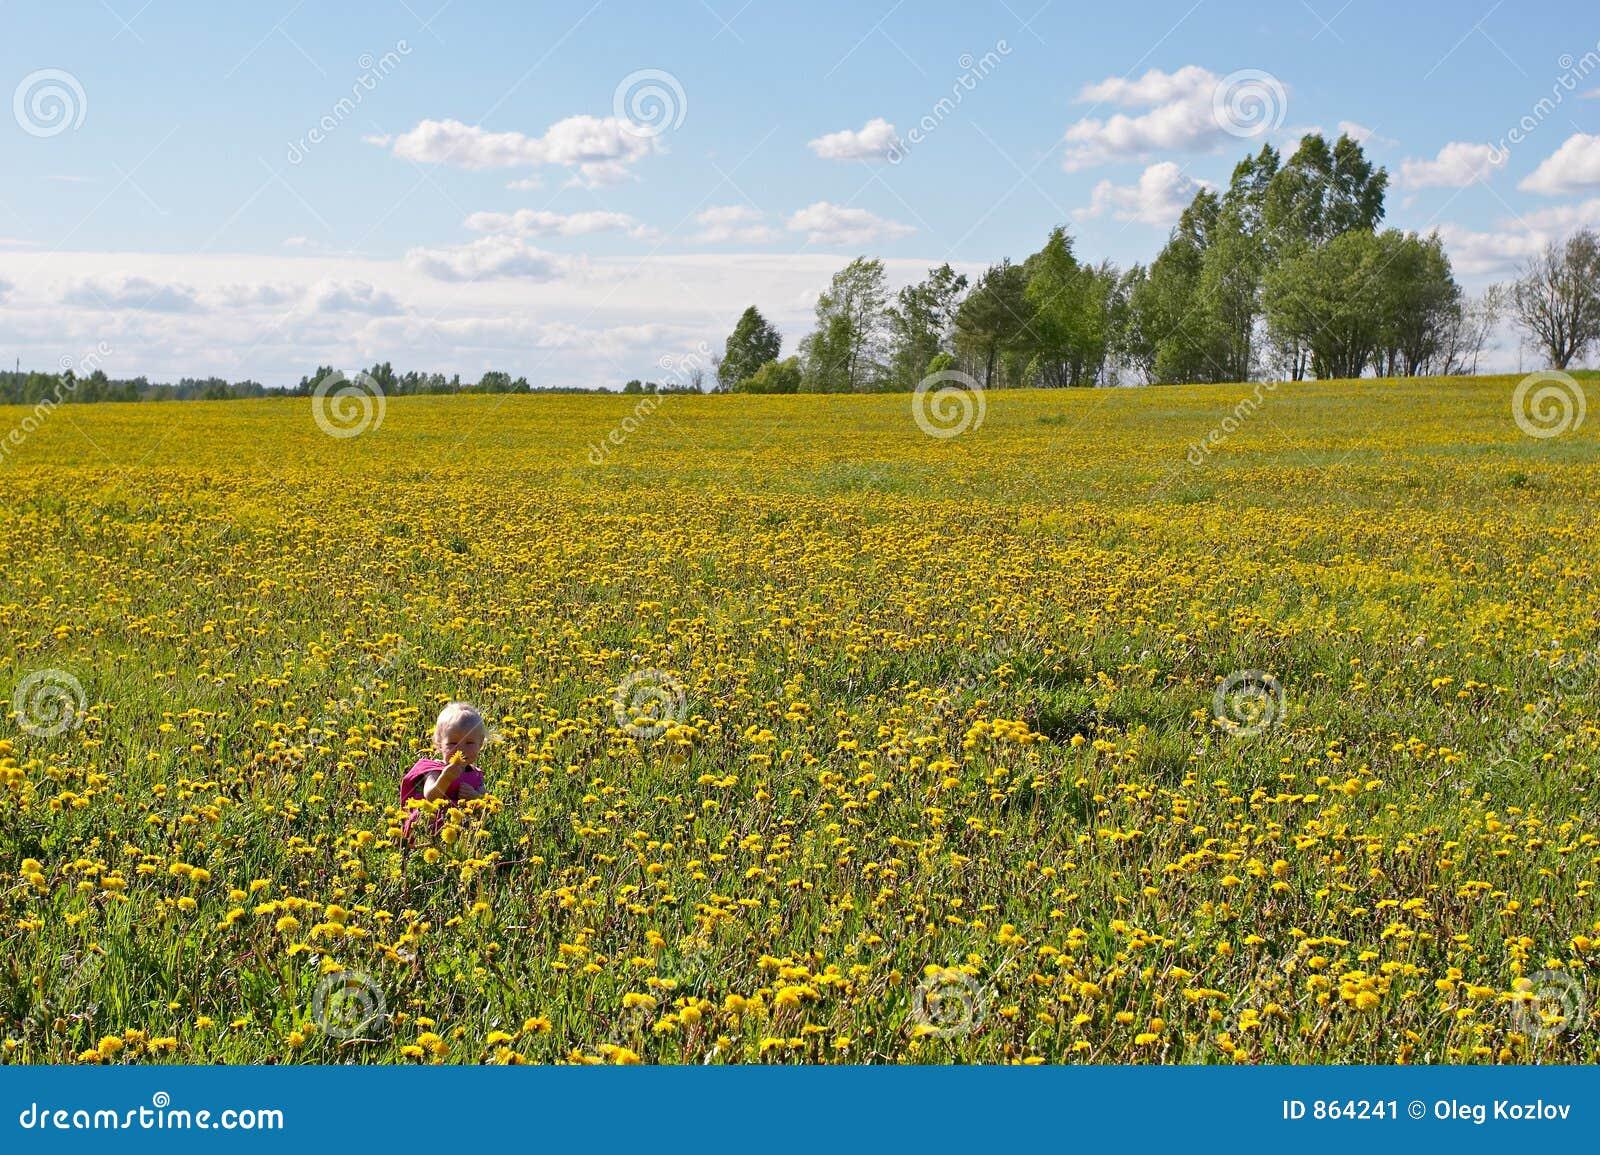 Little child among flowers